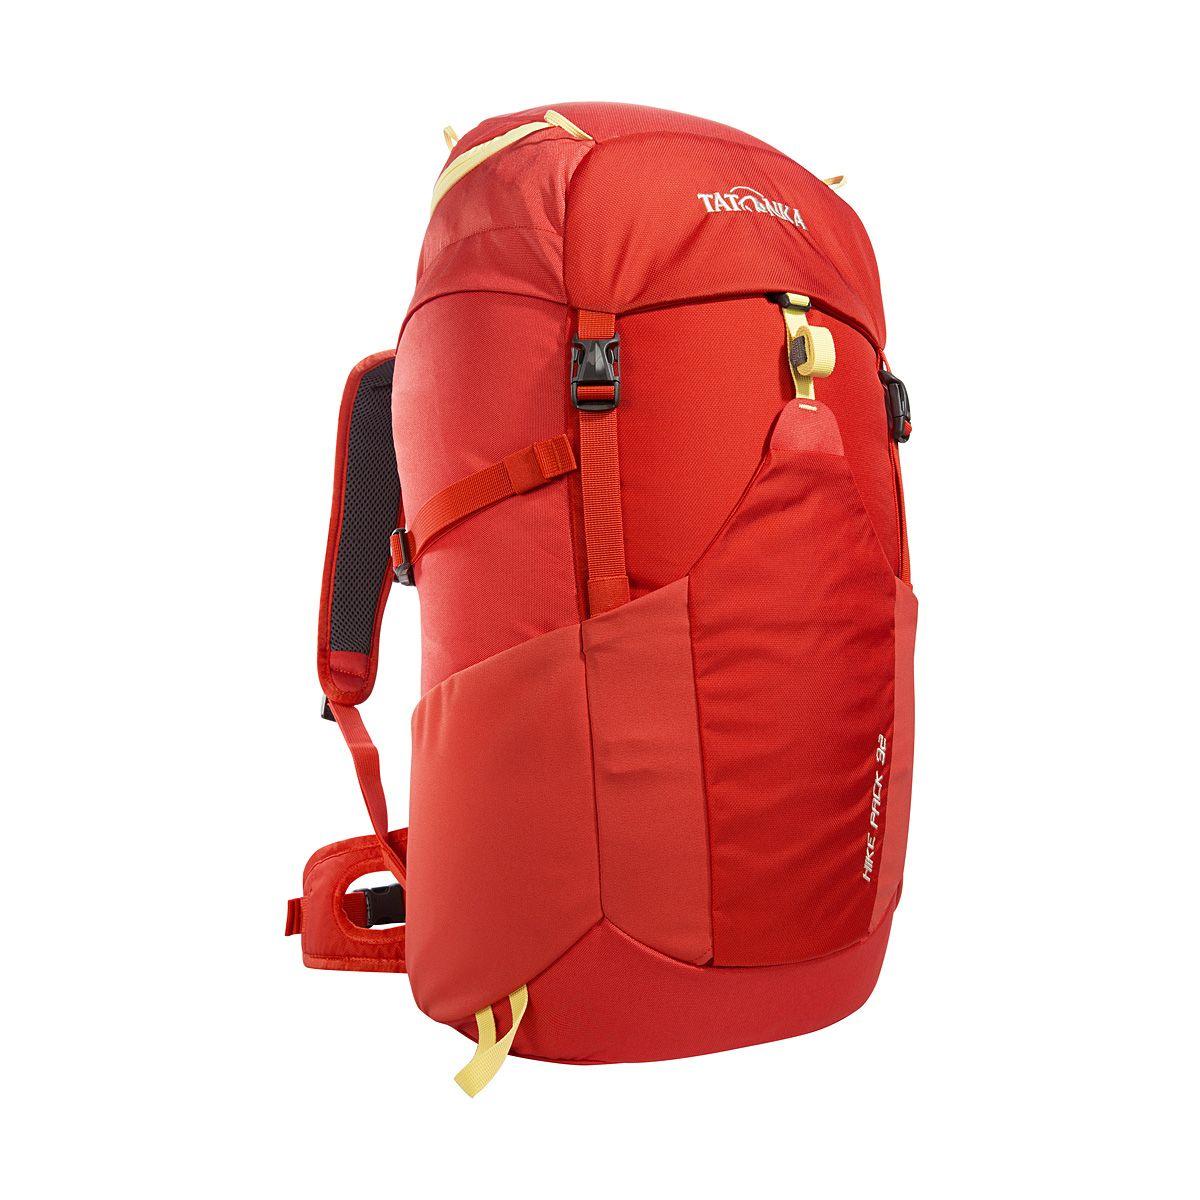 Tatonka Hike pack 32L(1)